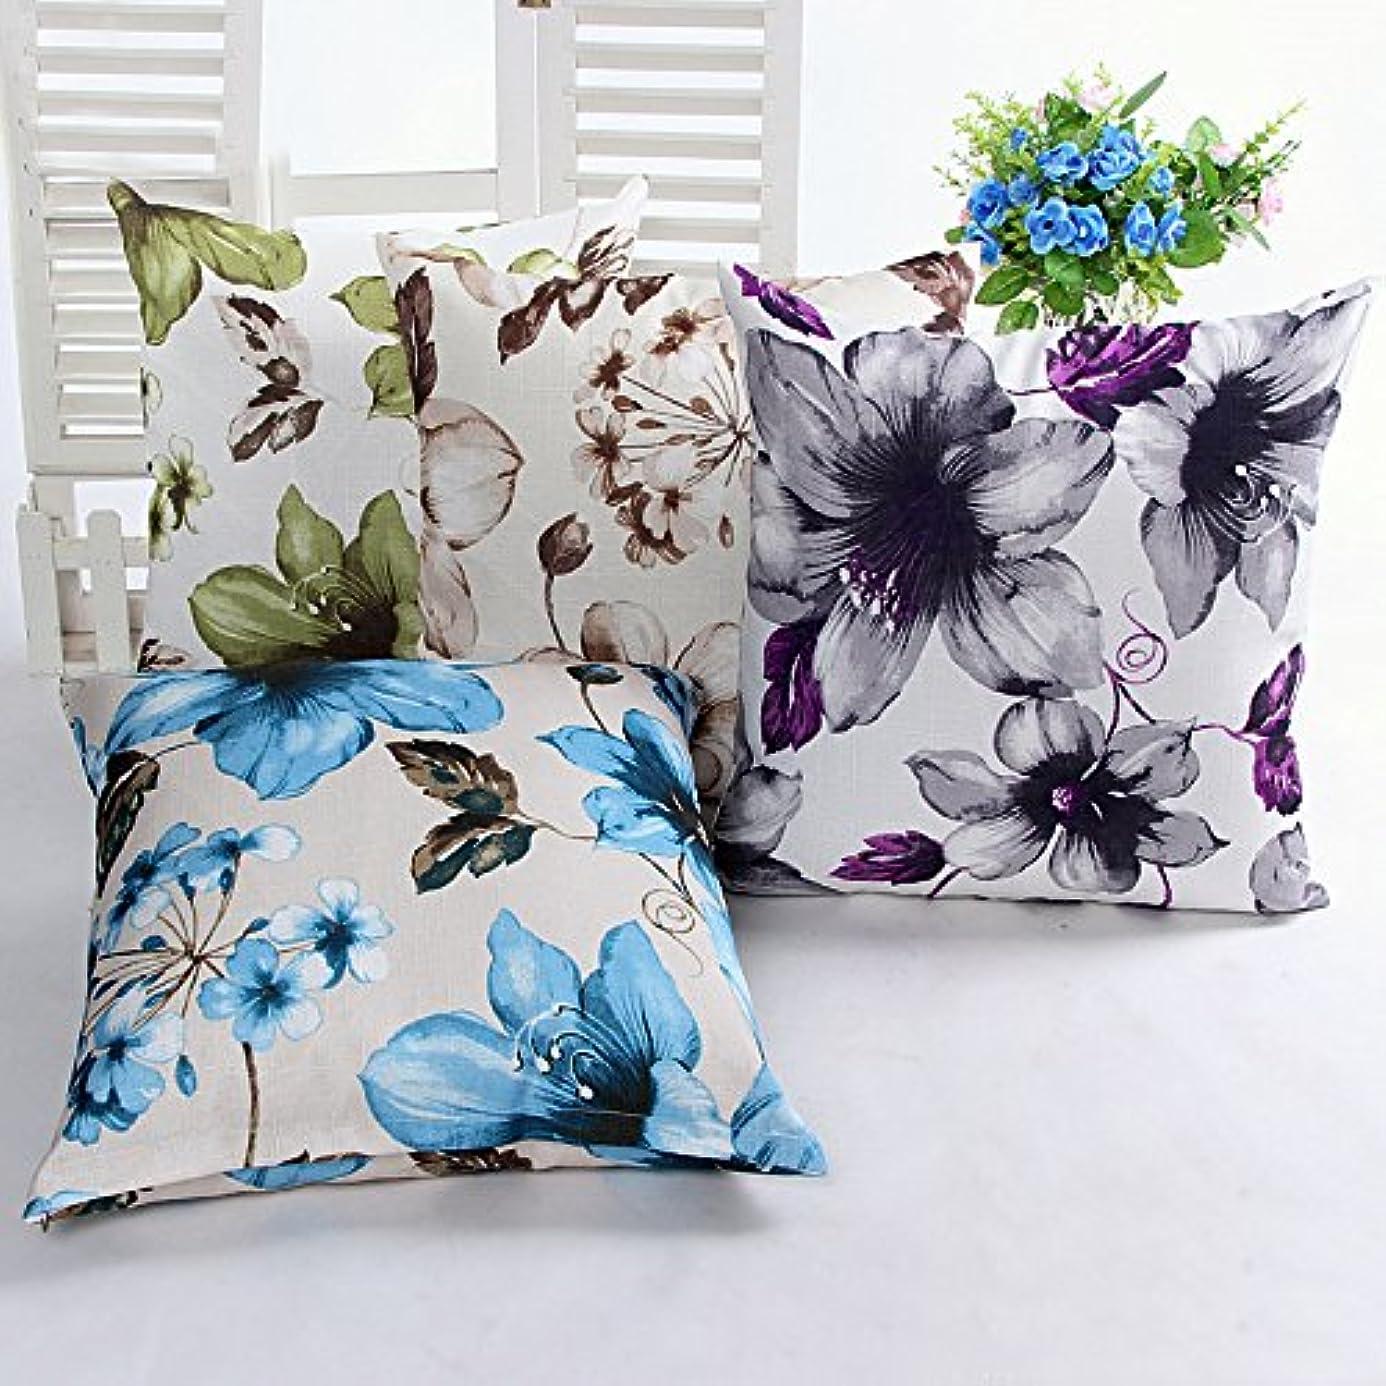 Pillow Cases - Honana Wx-D6 45x45cm Vintage Leaves Flower Bamboo Linen Throw Pillow Waist Cushion Cover - Time Origin Paper Rest Lawsuit Example Event Guinea Pig Pillowcase Sheath Causa - 1PCs